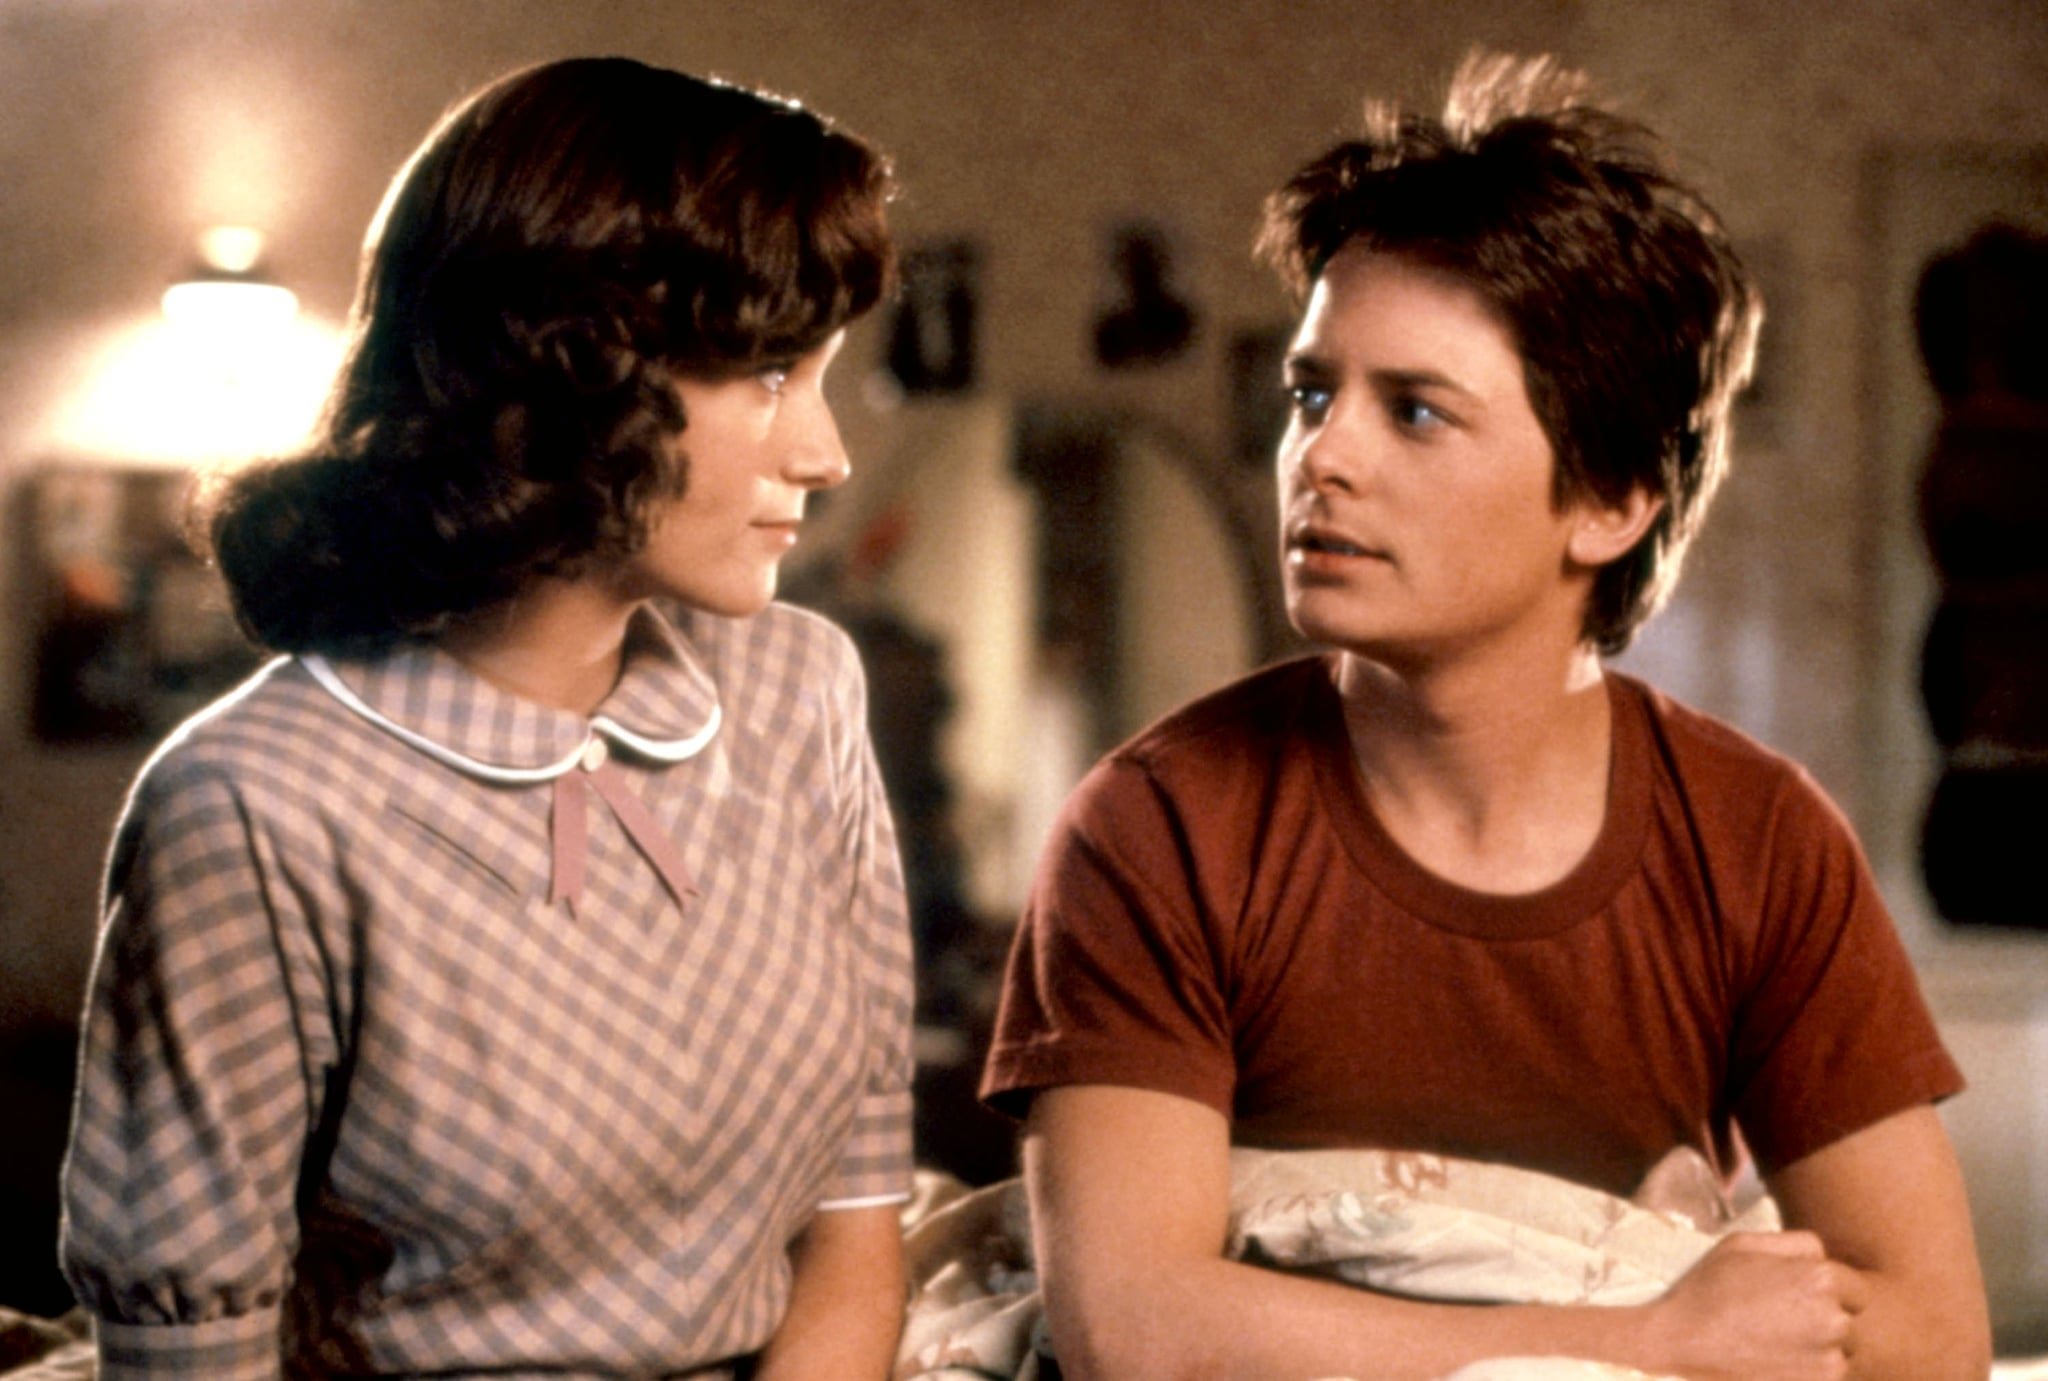 BACK TO THE FUTURE, Lea Thompson, Michael J. Fox, 1985, (c)Universal/courtesy Everett Collection